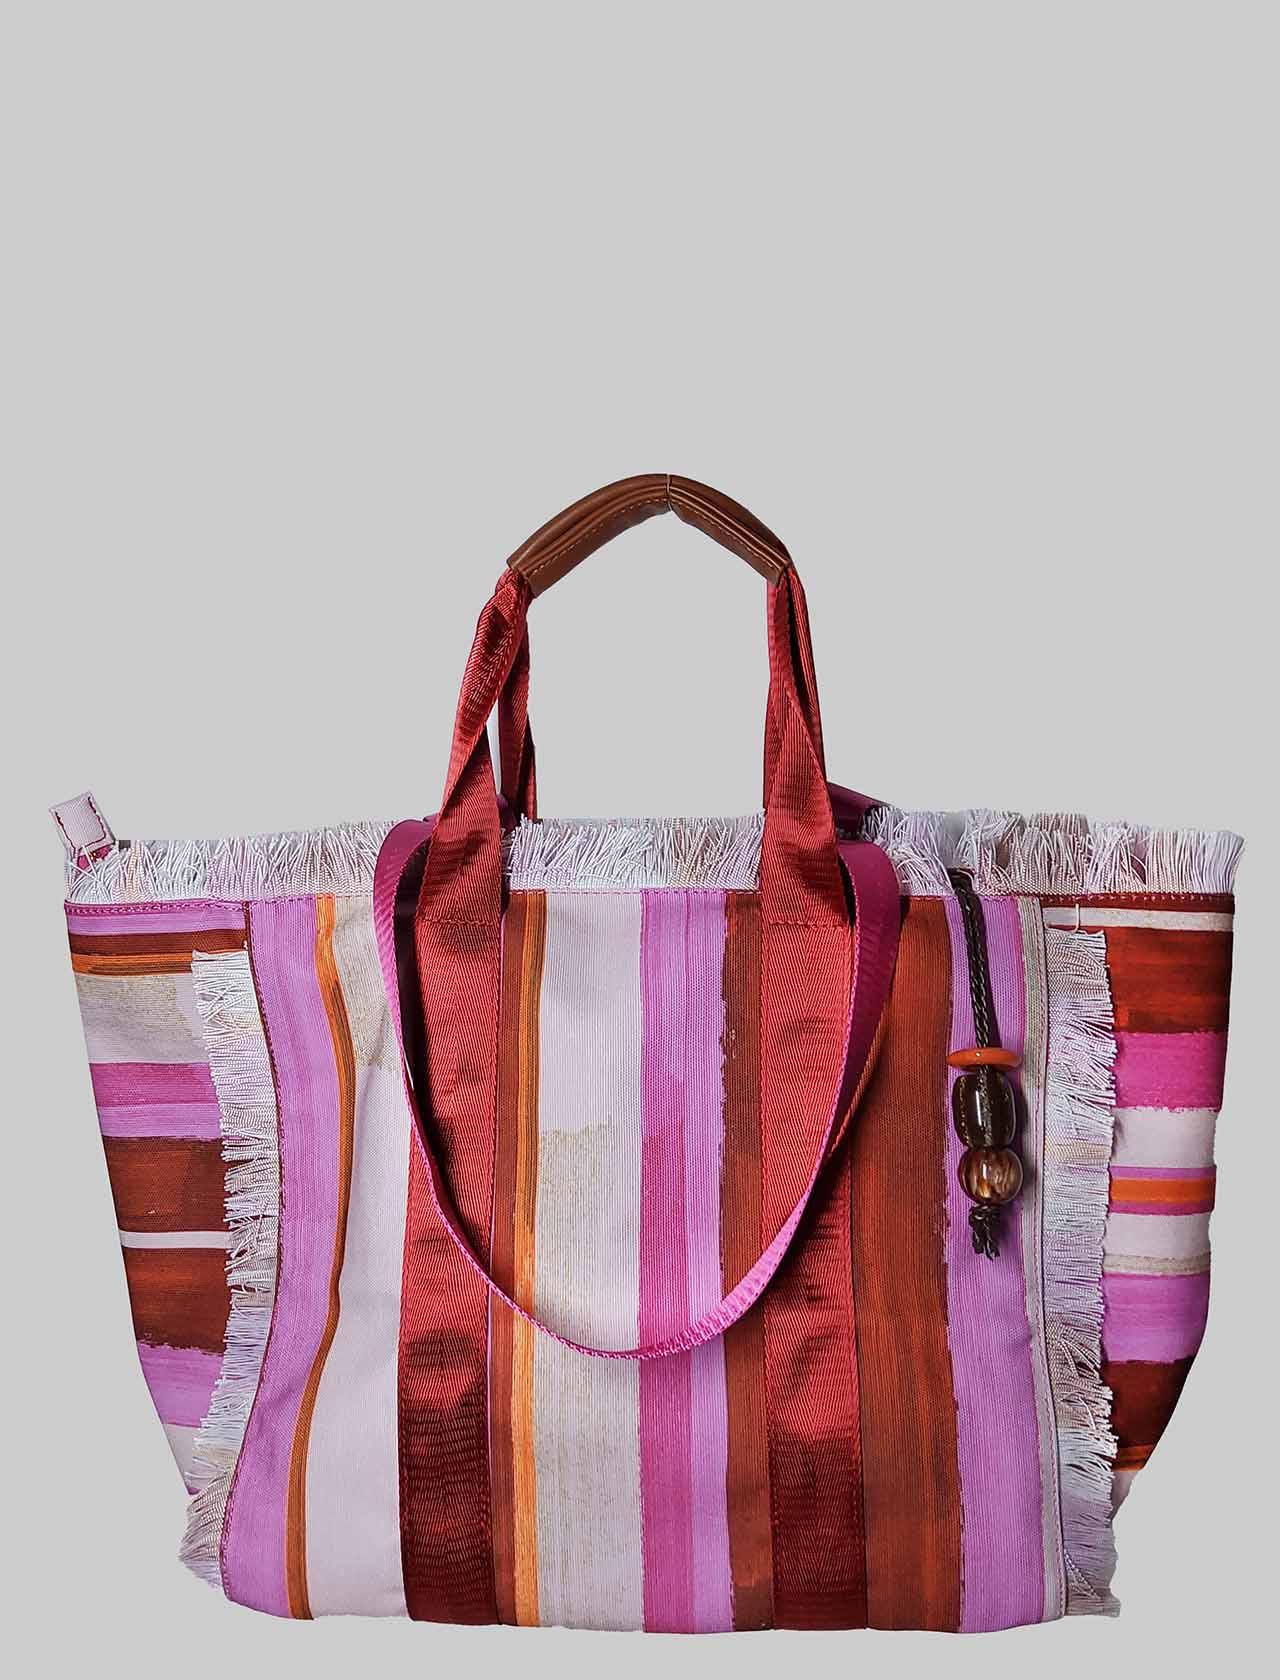 Borsa Donna Shopping Painted Stripes in Cotone a Fantasia Rosa e Rosso Maliparmi | Borse e zaini | BH026010135B3223